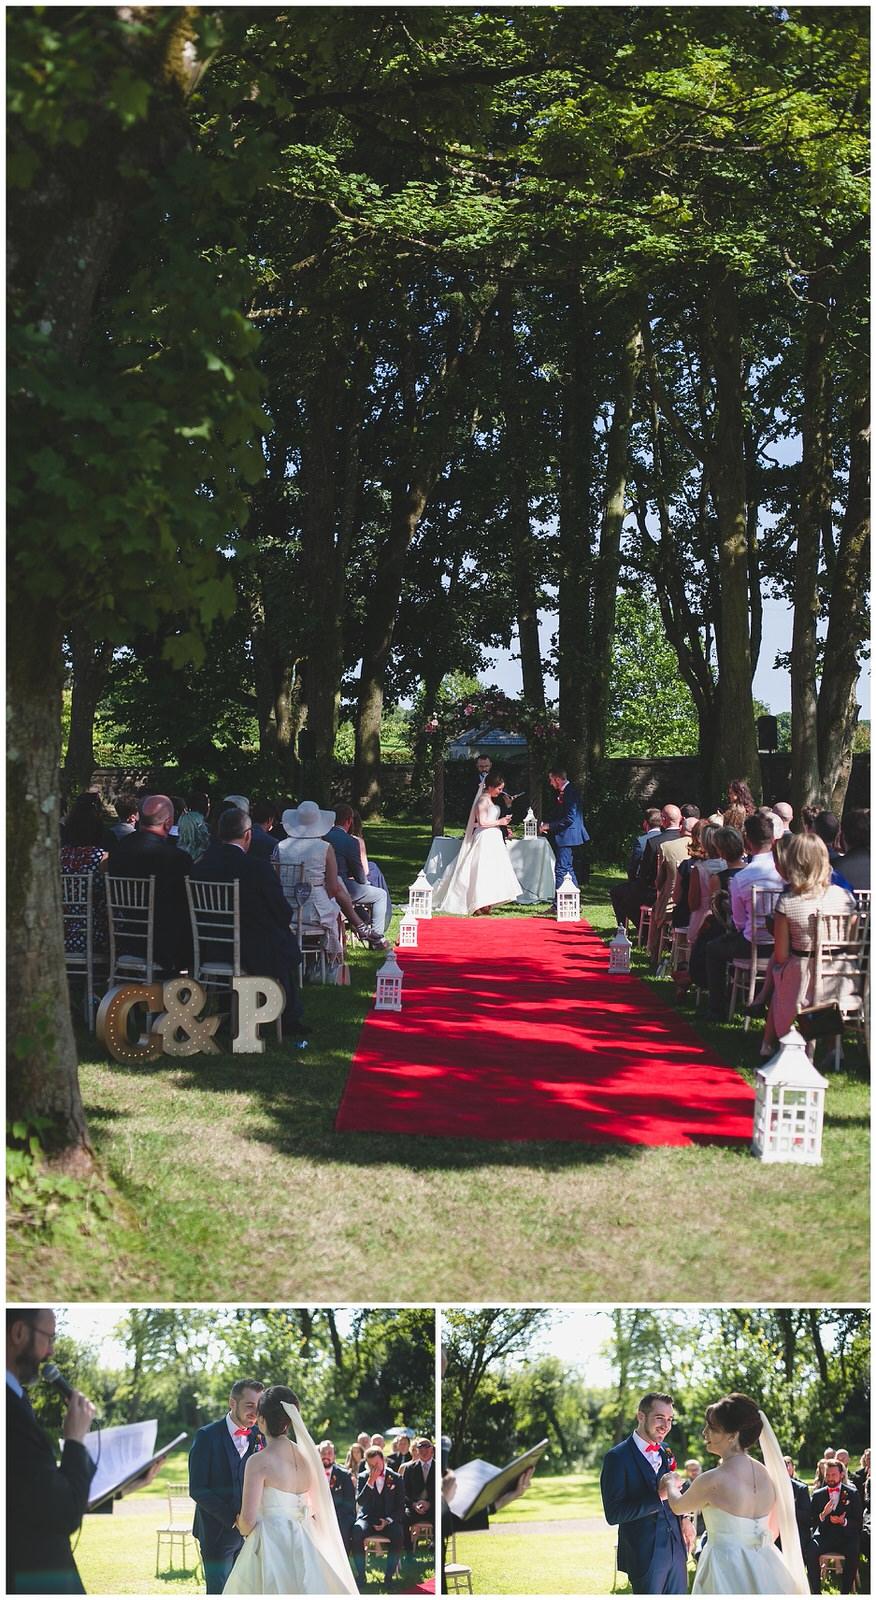 Clonabreany House Wedding Outdoor Garden Ceremony